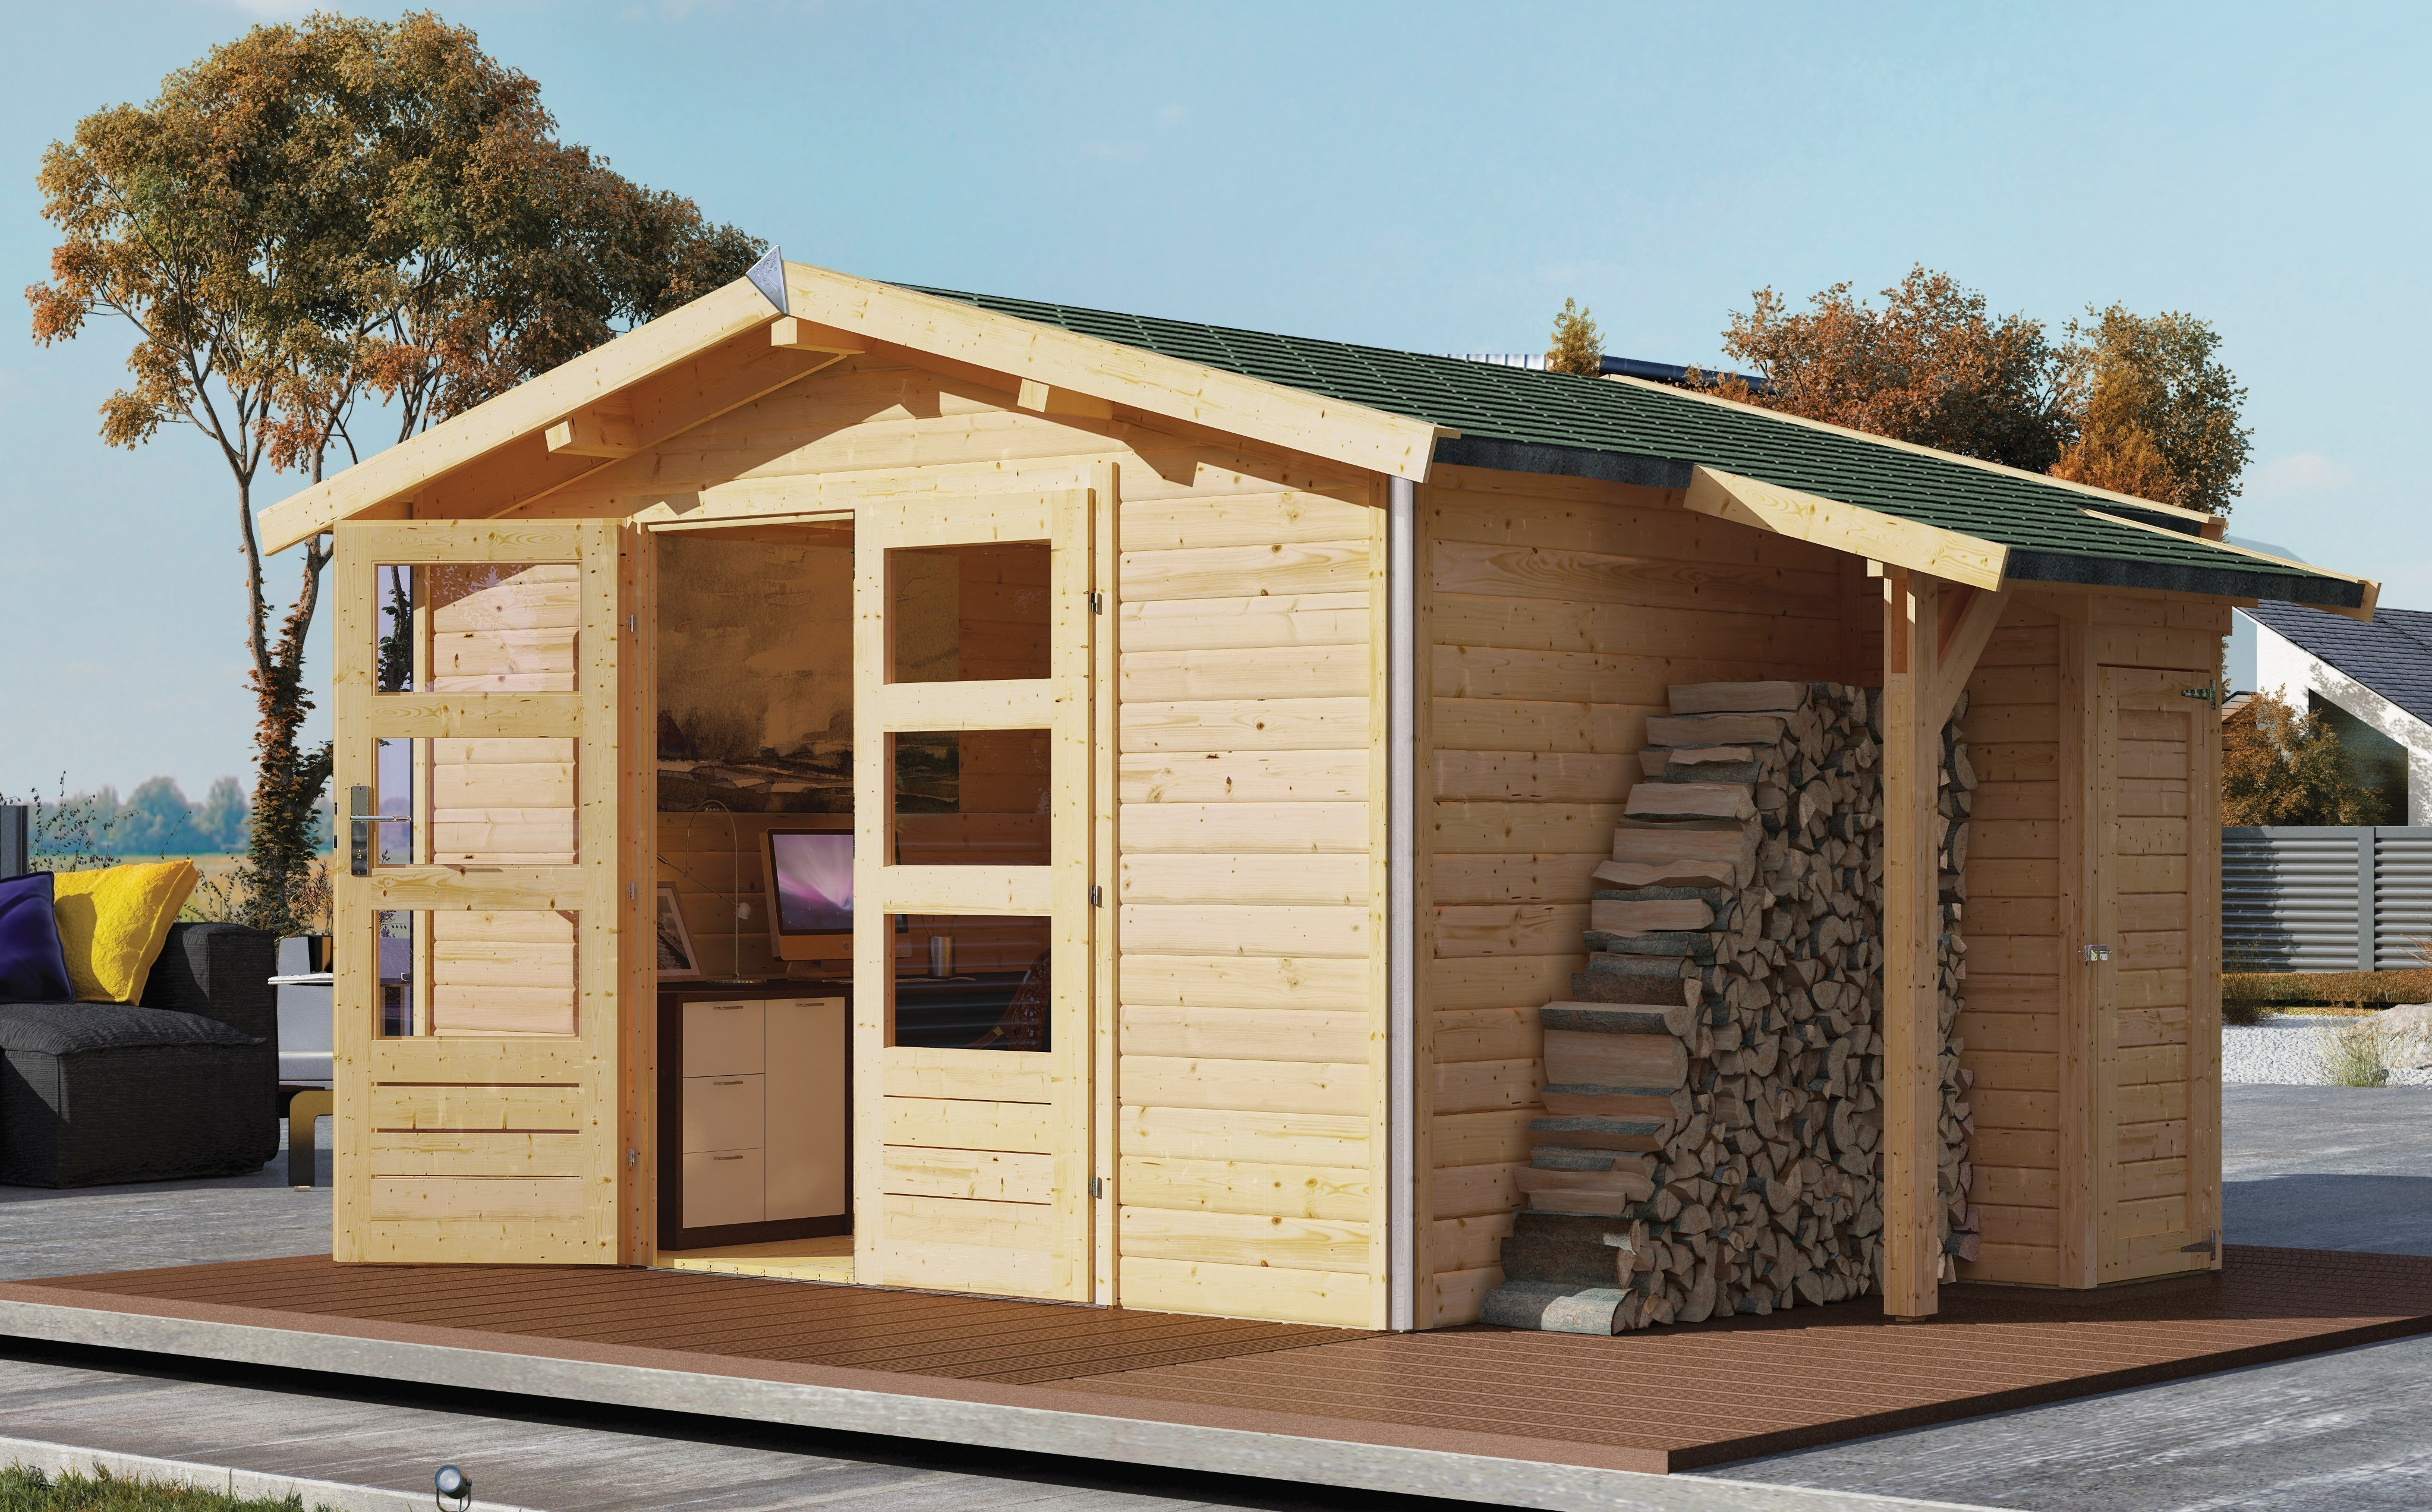 karibu gartenhaus 40mm angelburg 3 grau 347x343cm bei. Black Bedroom Furniture Sets. Home Design Ideas